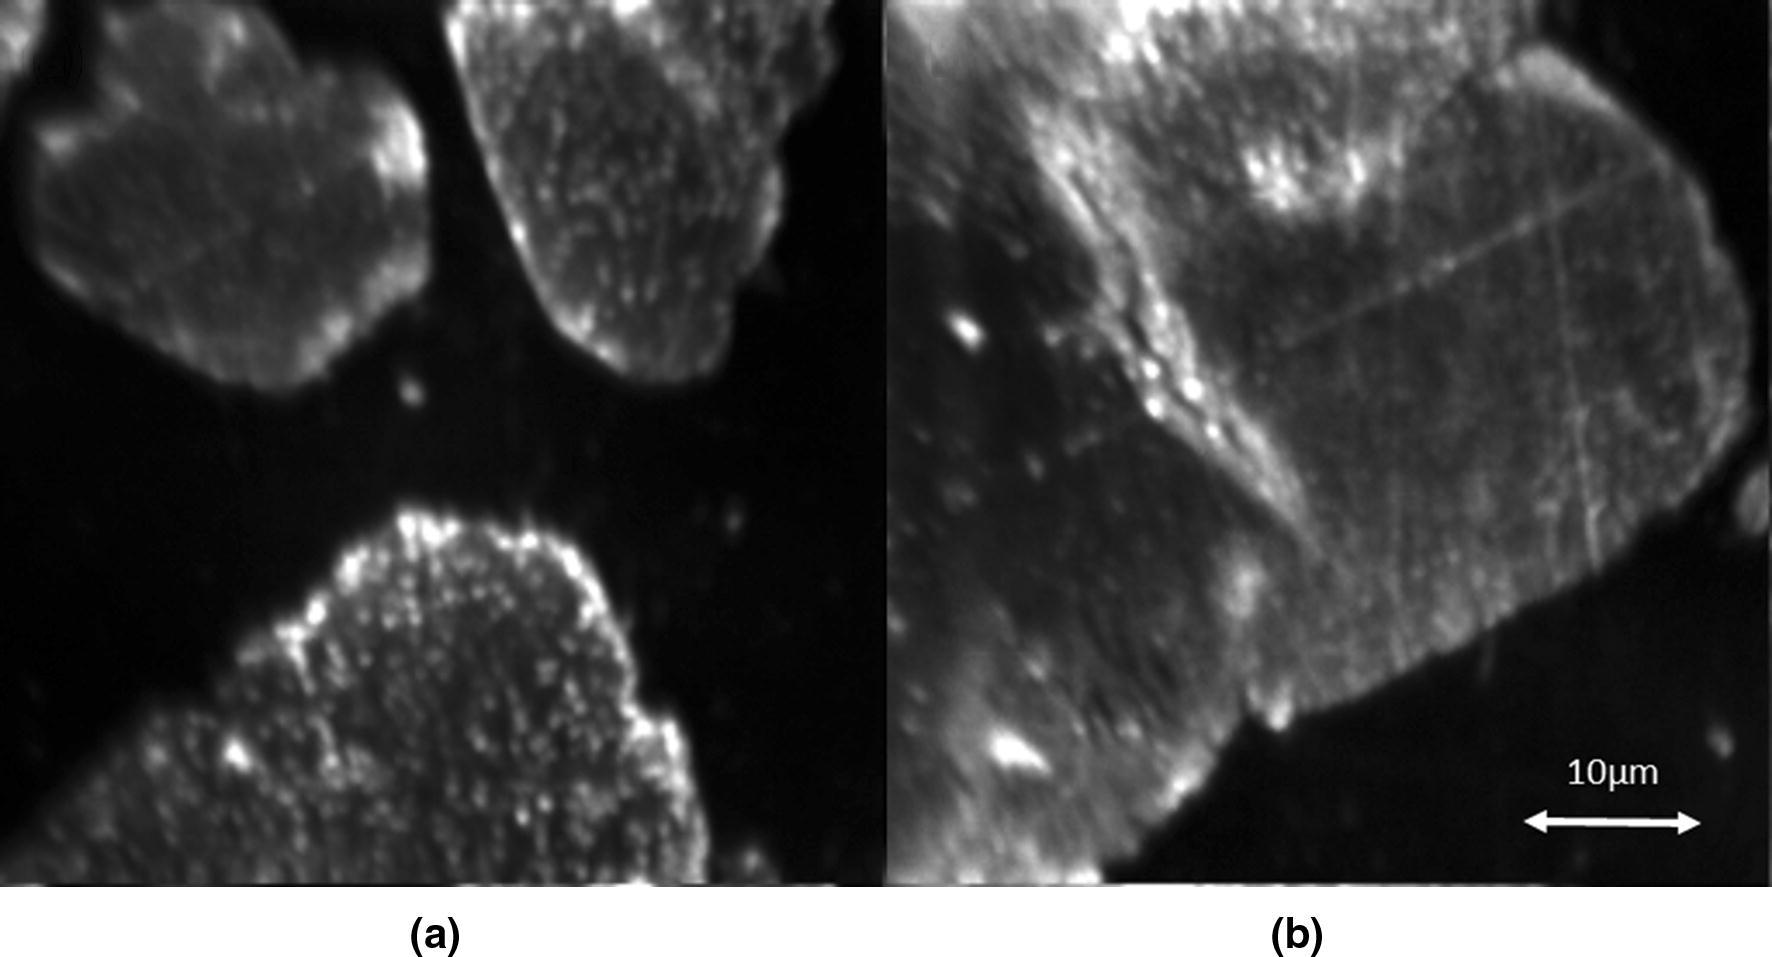 Balancing sodium impurities in alumina for improved properties